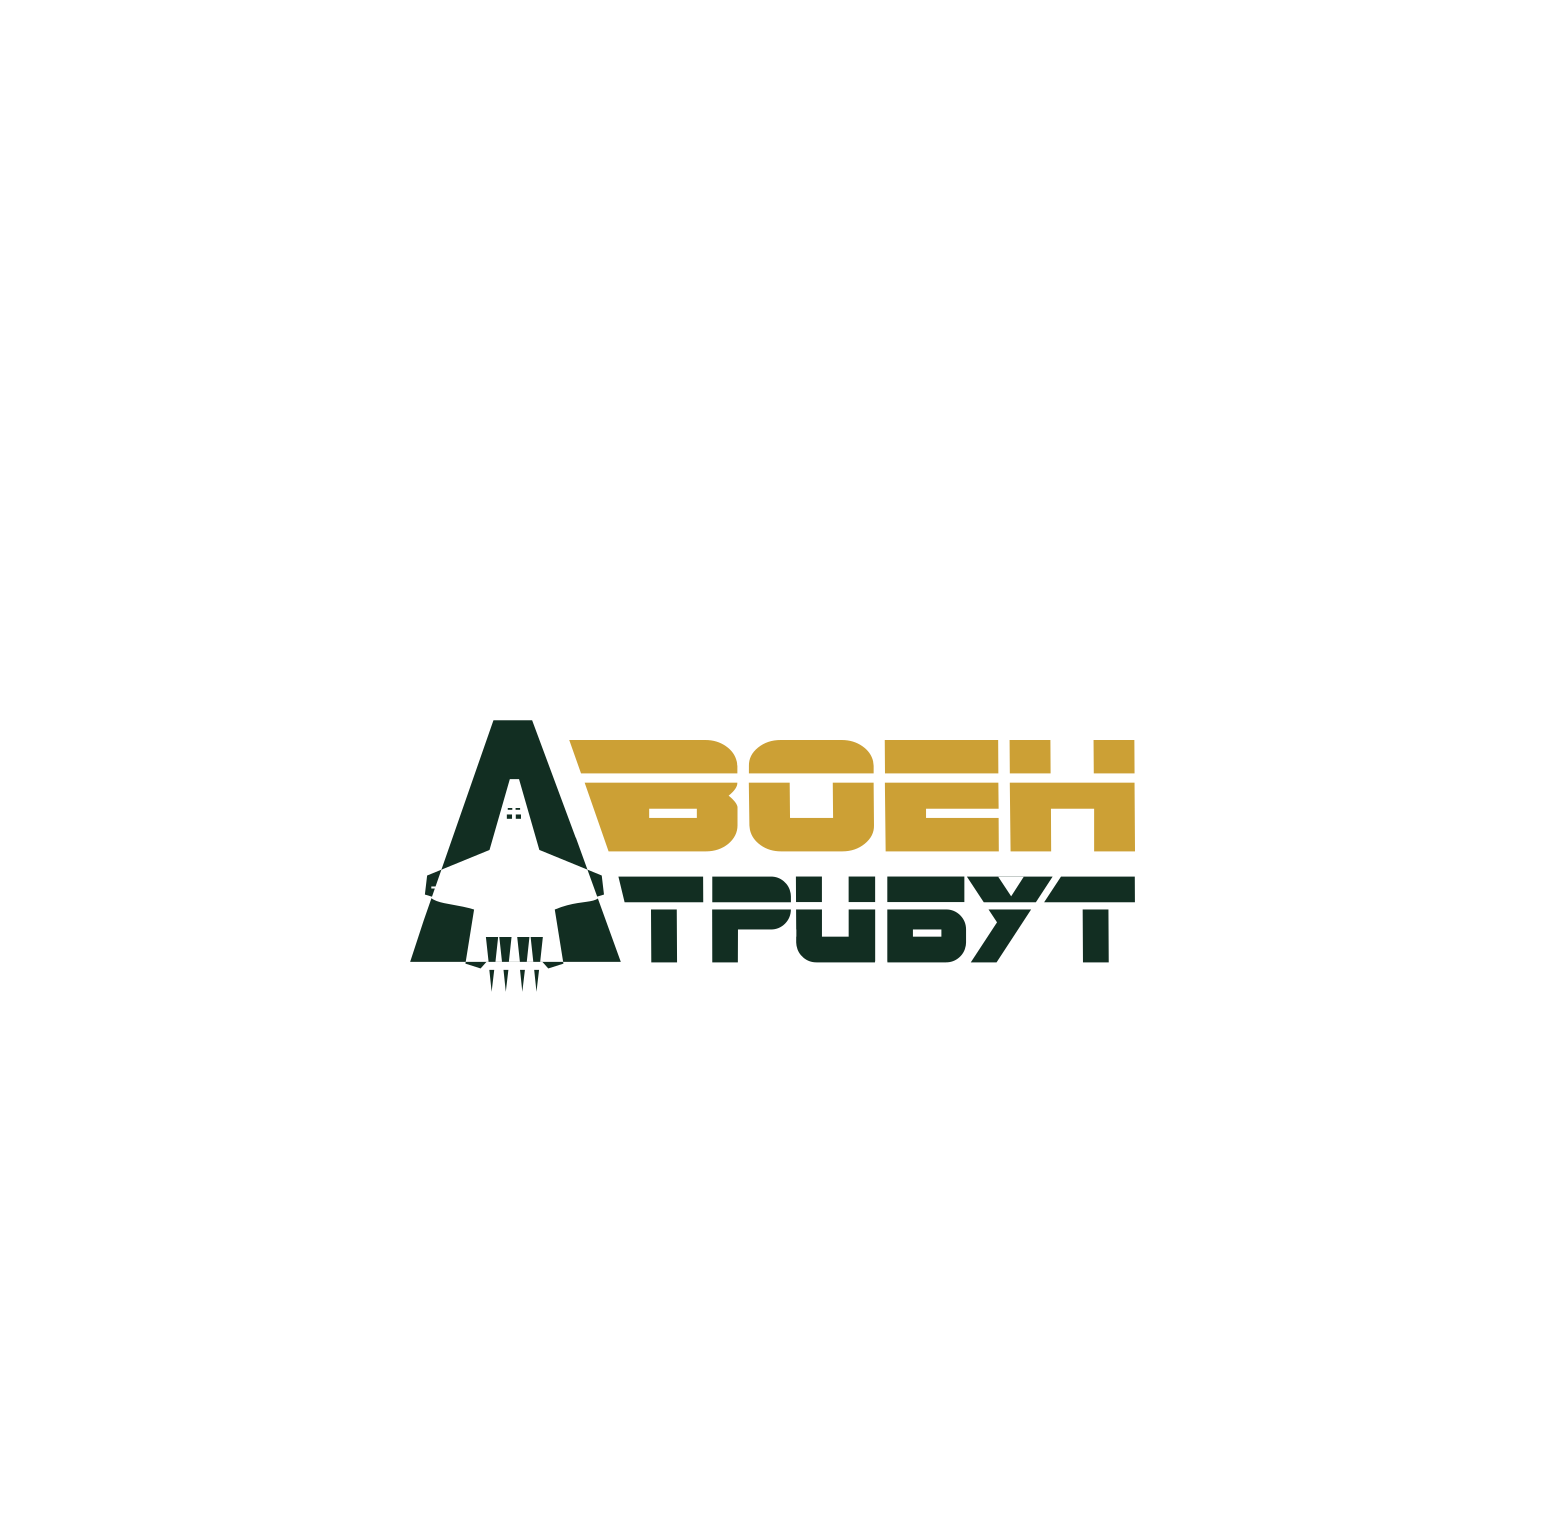 Разработка логотипа для компании военной тематики фото f_64260229f8e20fc9.png